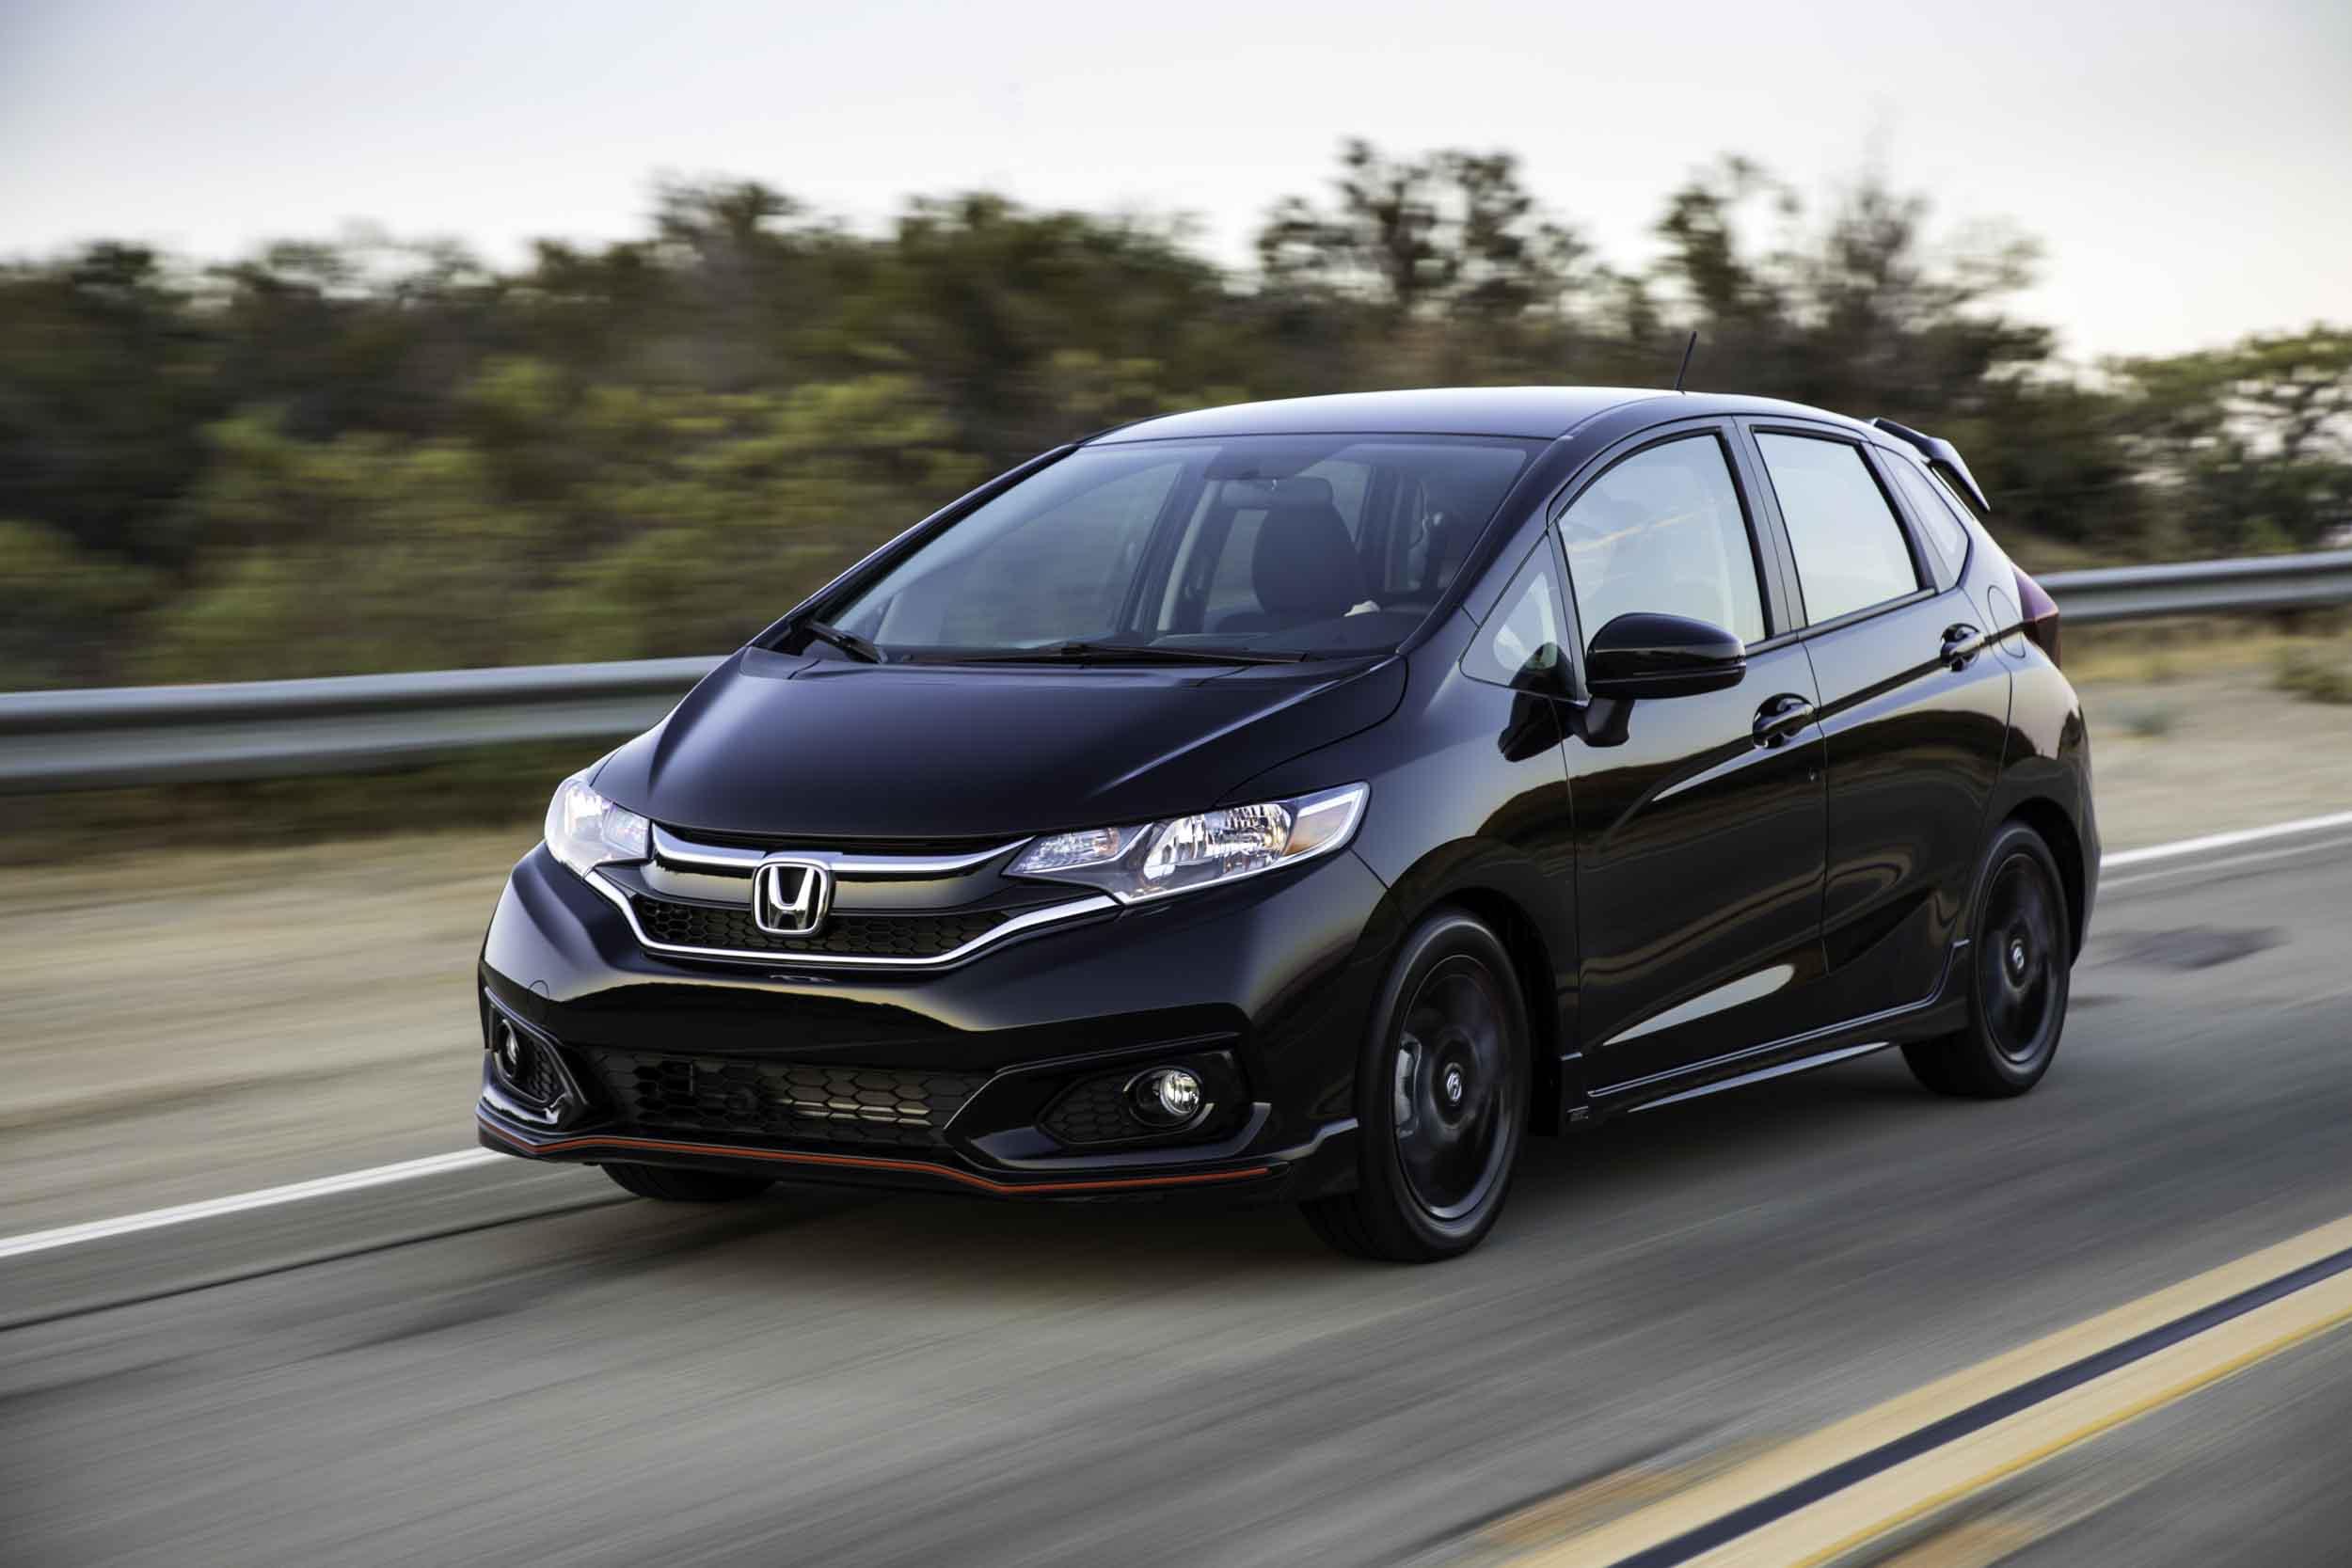 2018 Honda Fit Sport • Carfanatics Blog